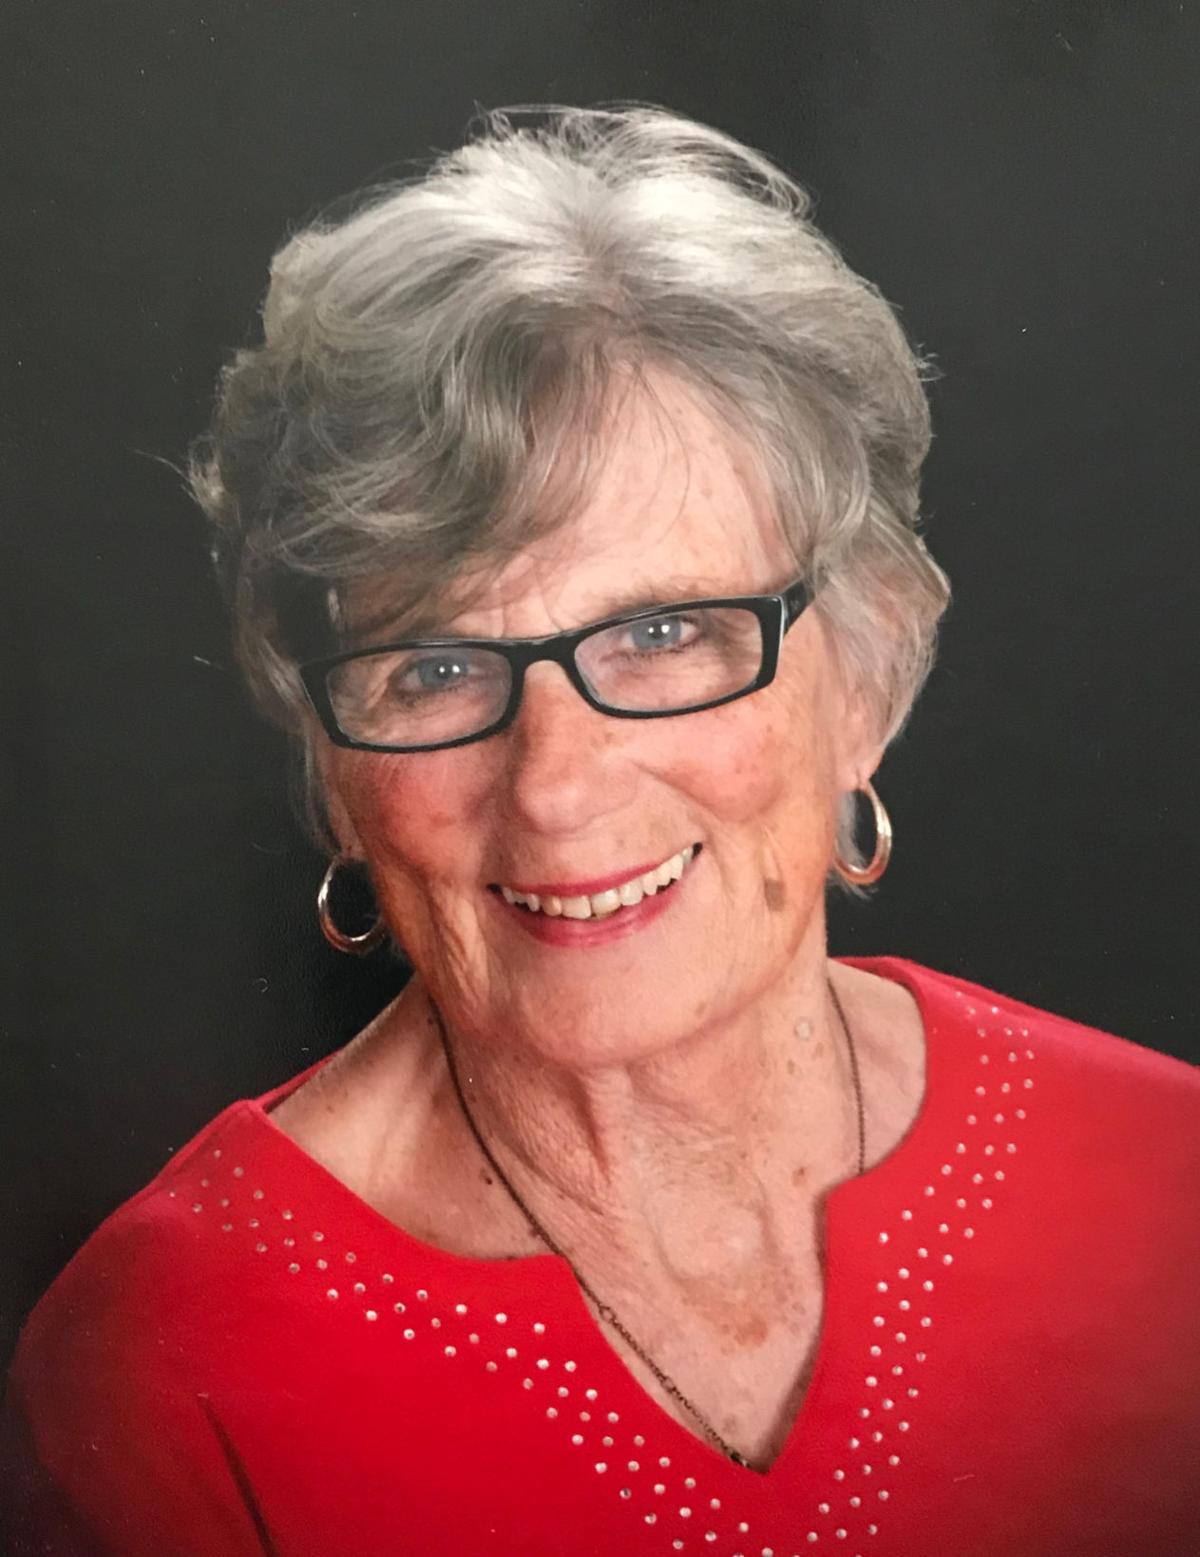 Judy Corkery